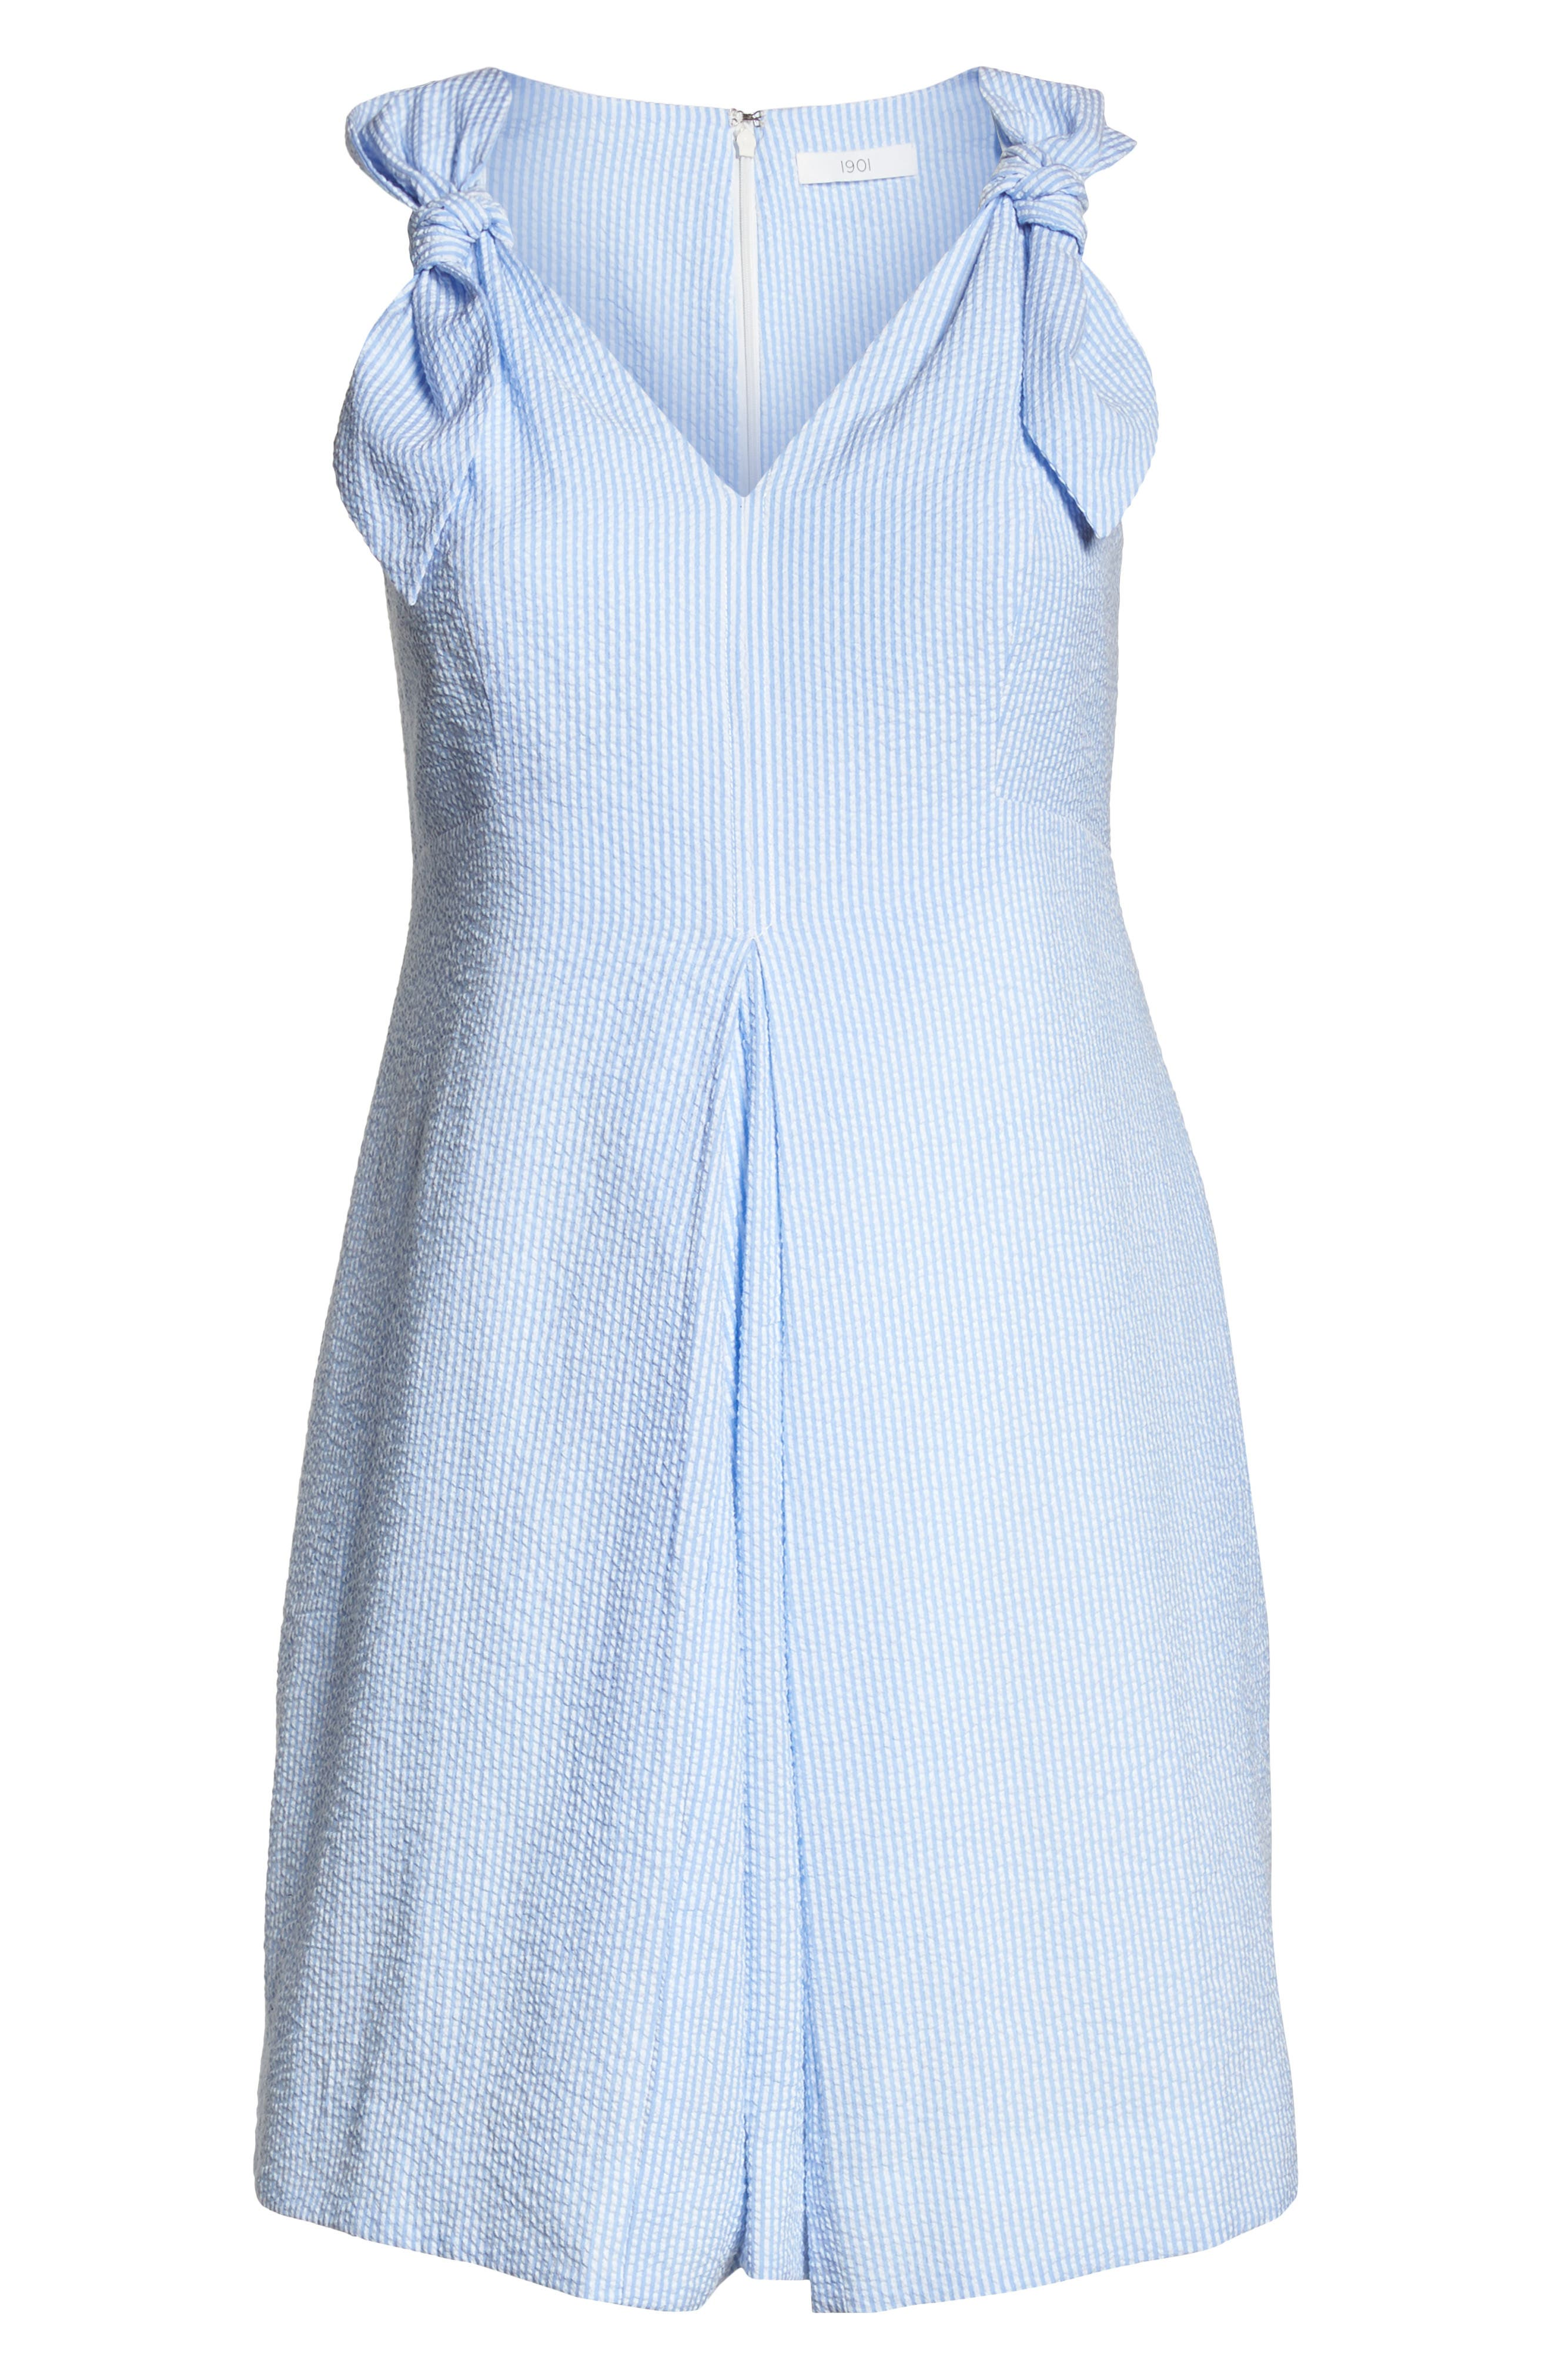 Bow Shoulder Seersucker Dress,                             Alternate thumbnail 8, color,                             Blue Seersucker Stripe